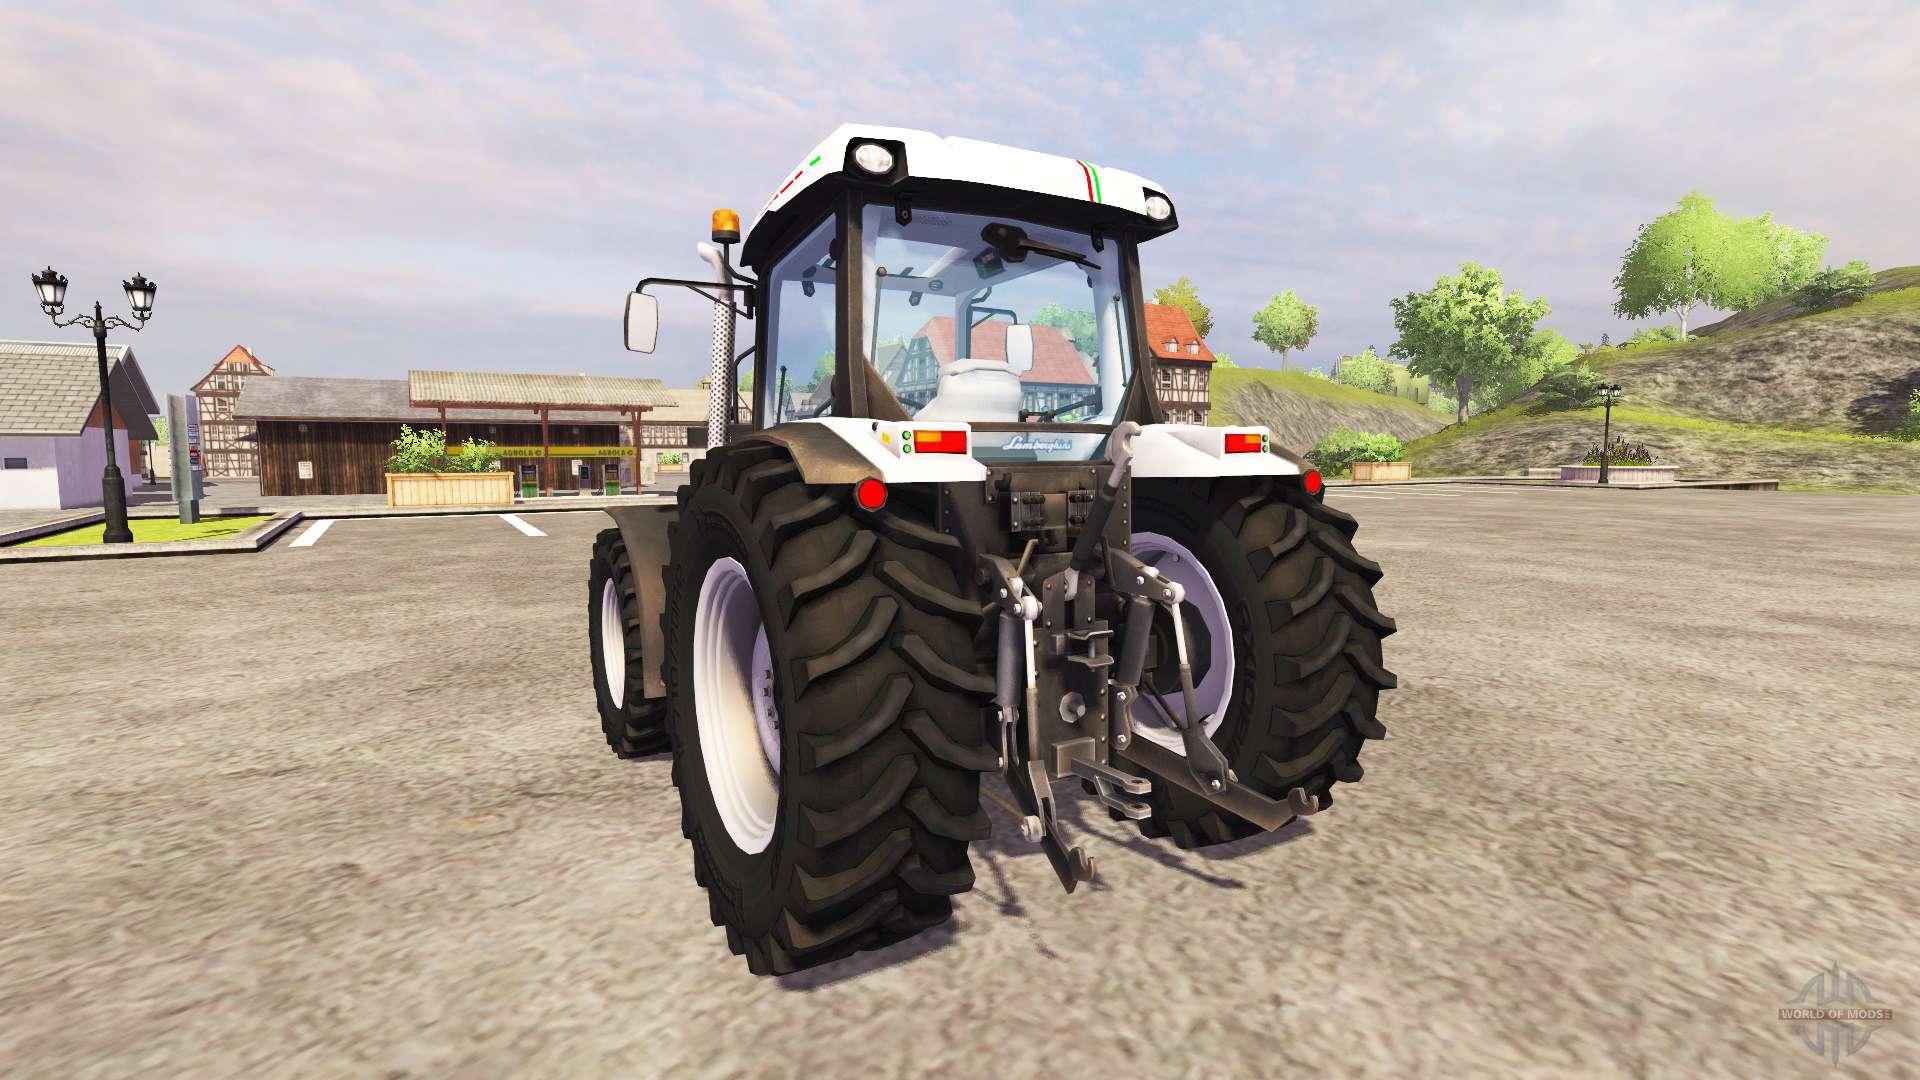 lamborghini r4 110 italia fl for farming simulator 2013 rh worldofmods com Lamborghini Monster Truck Lamborghini SUV